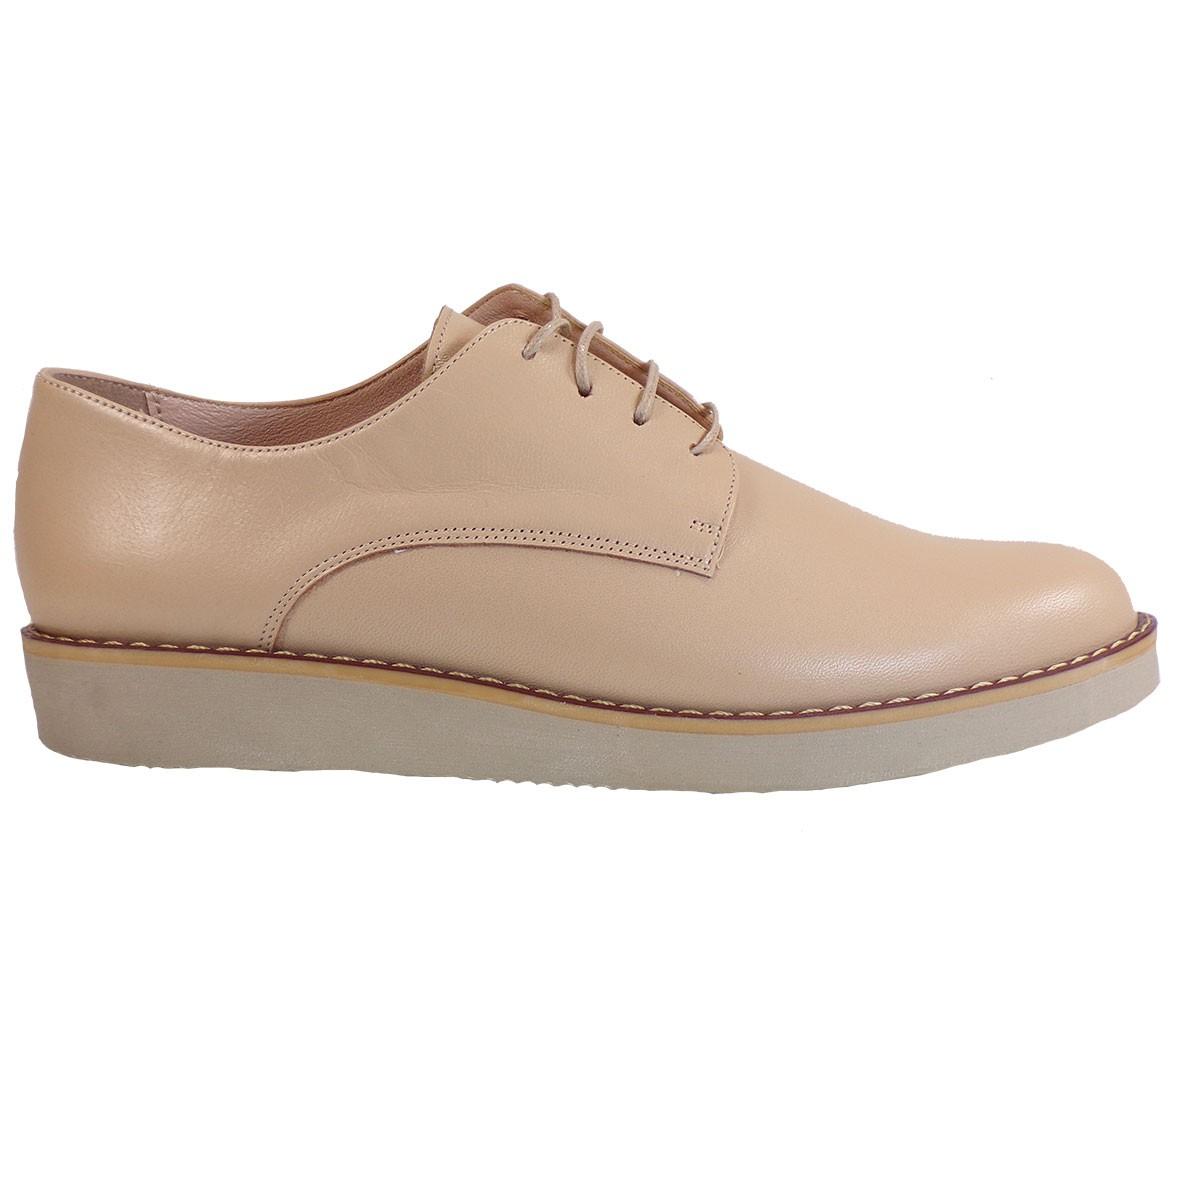 075ec5dddd Moods Shoes Oxford Παπούτσια Γυναικεία 1001 Νude Δέρμα – IShoeStore